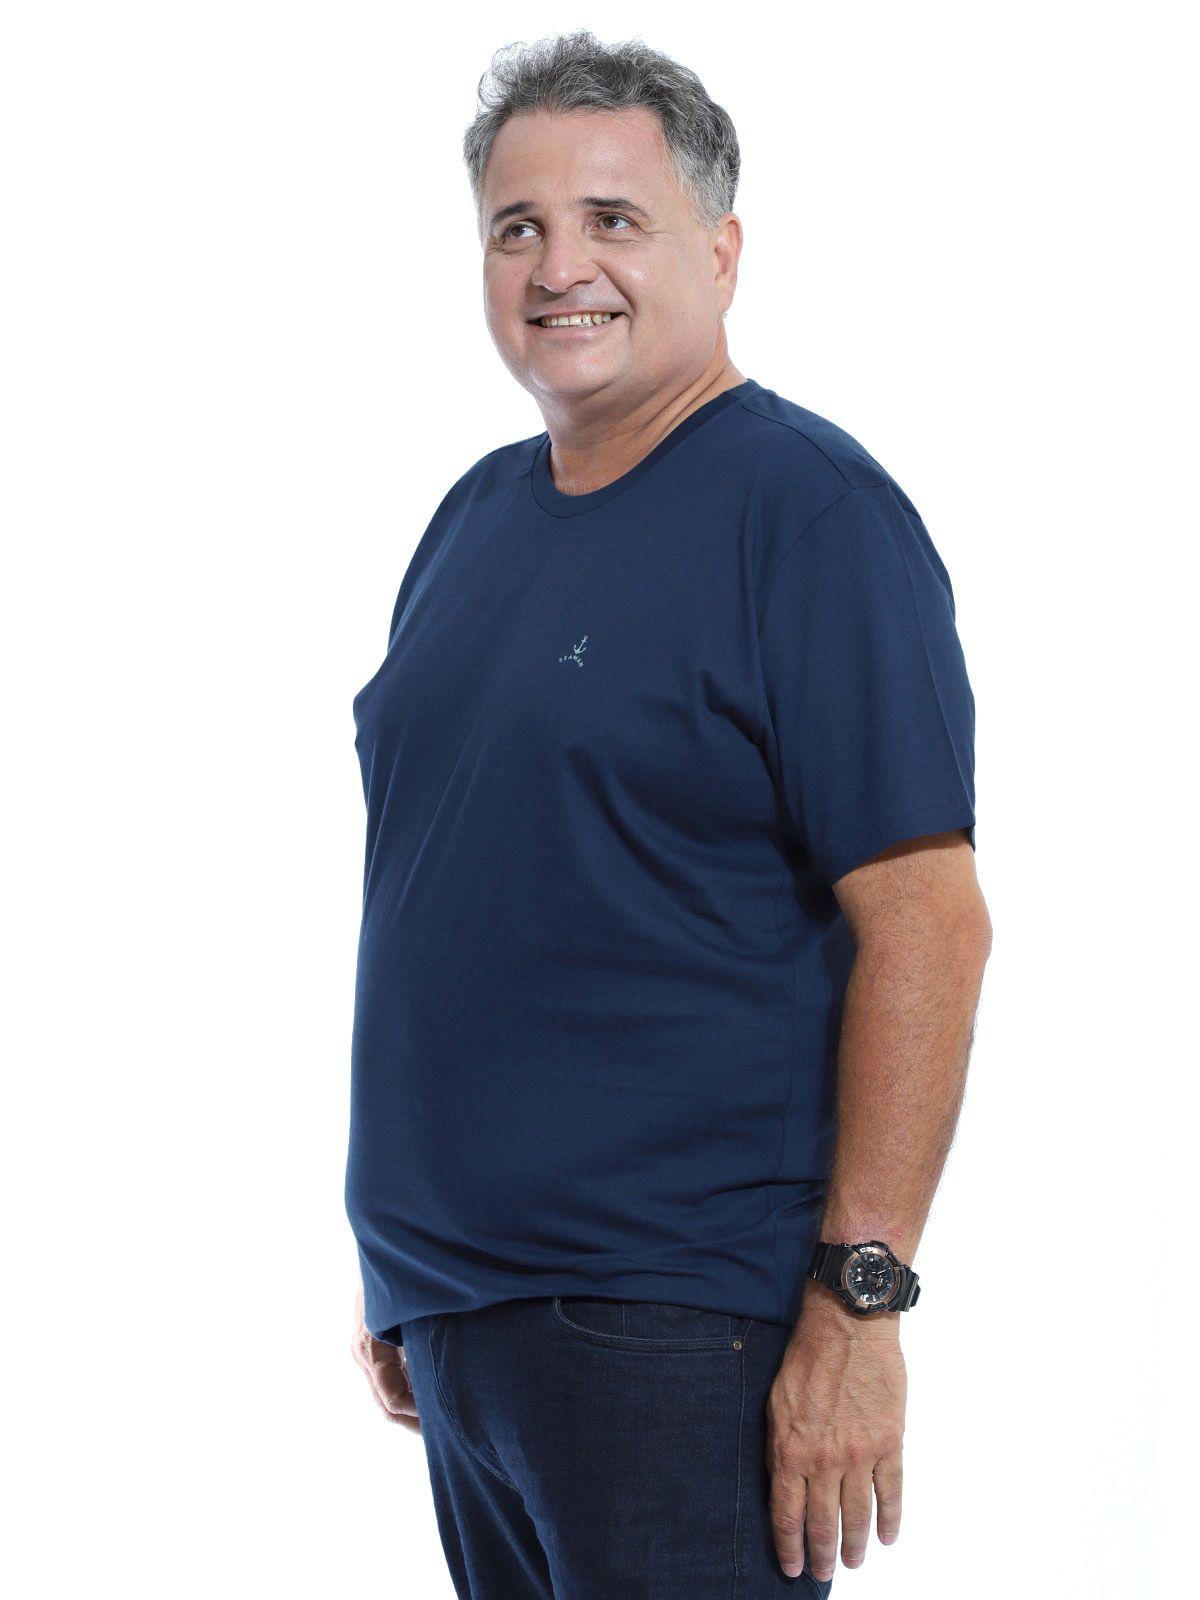 Camiseta Plus Size Anistia Sea Marinho